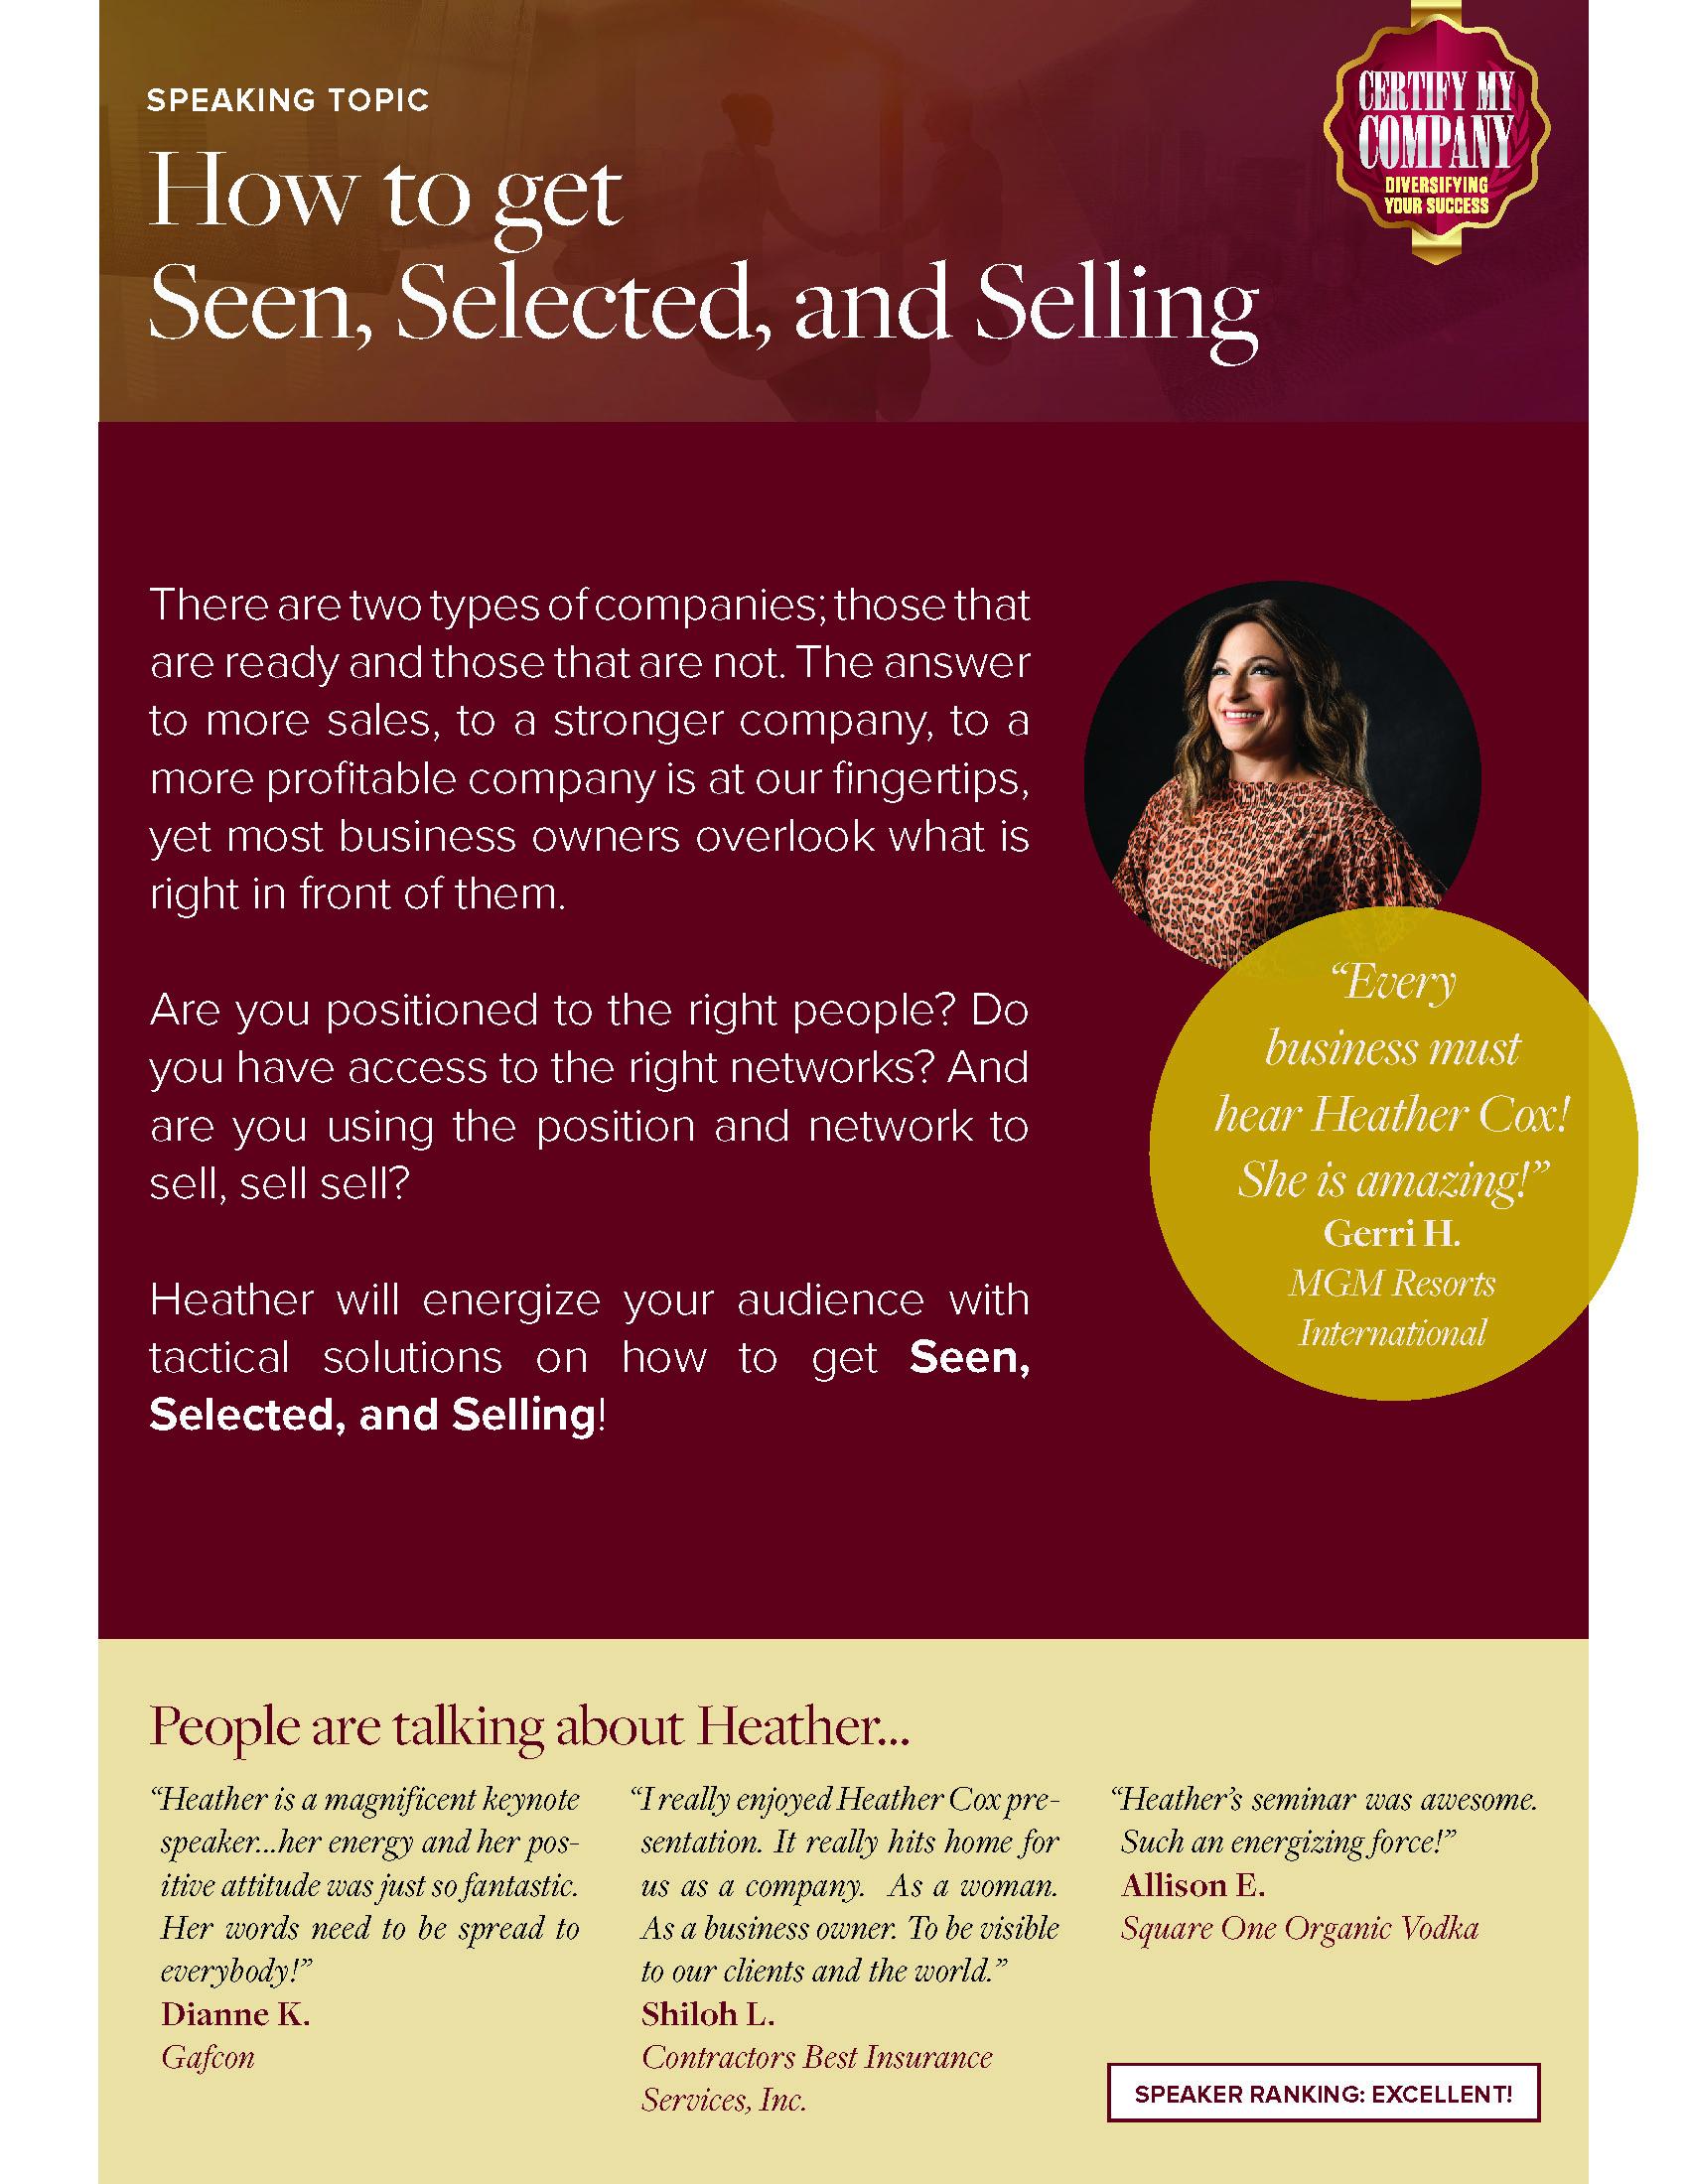 Click to download Heather's Business Development speaker sheet: